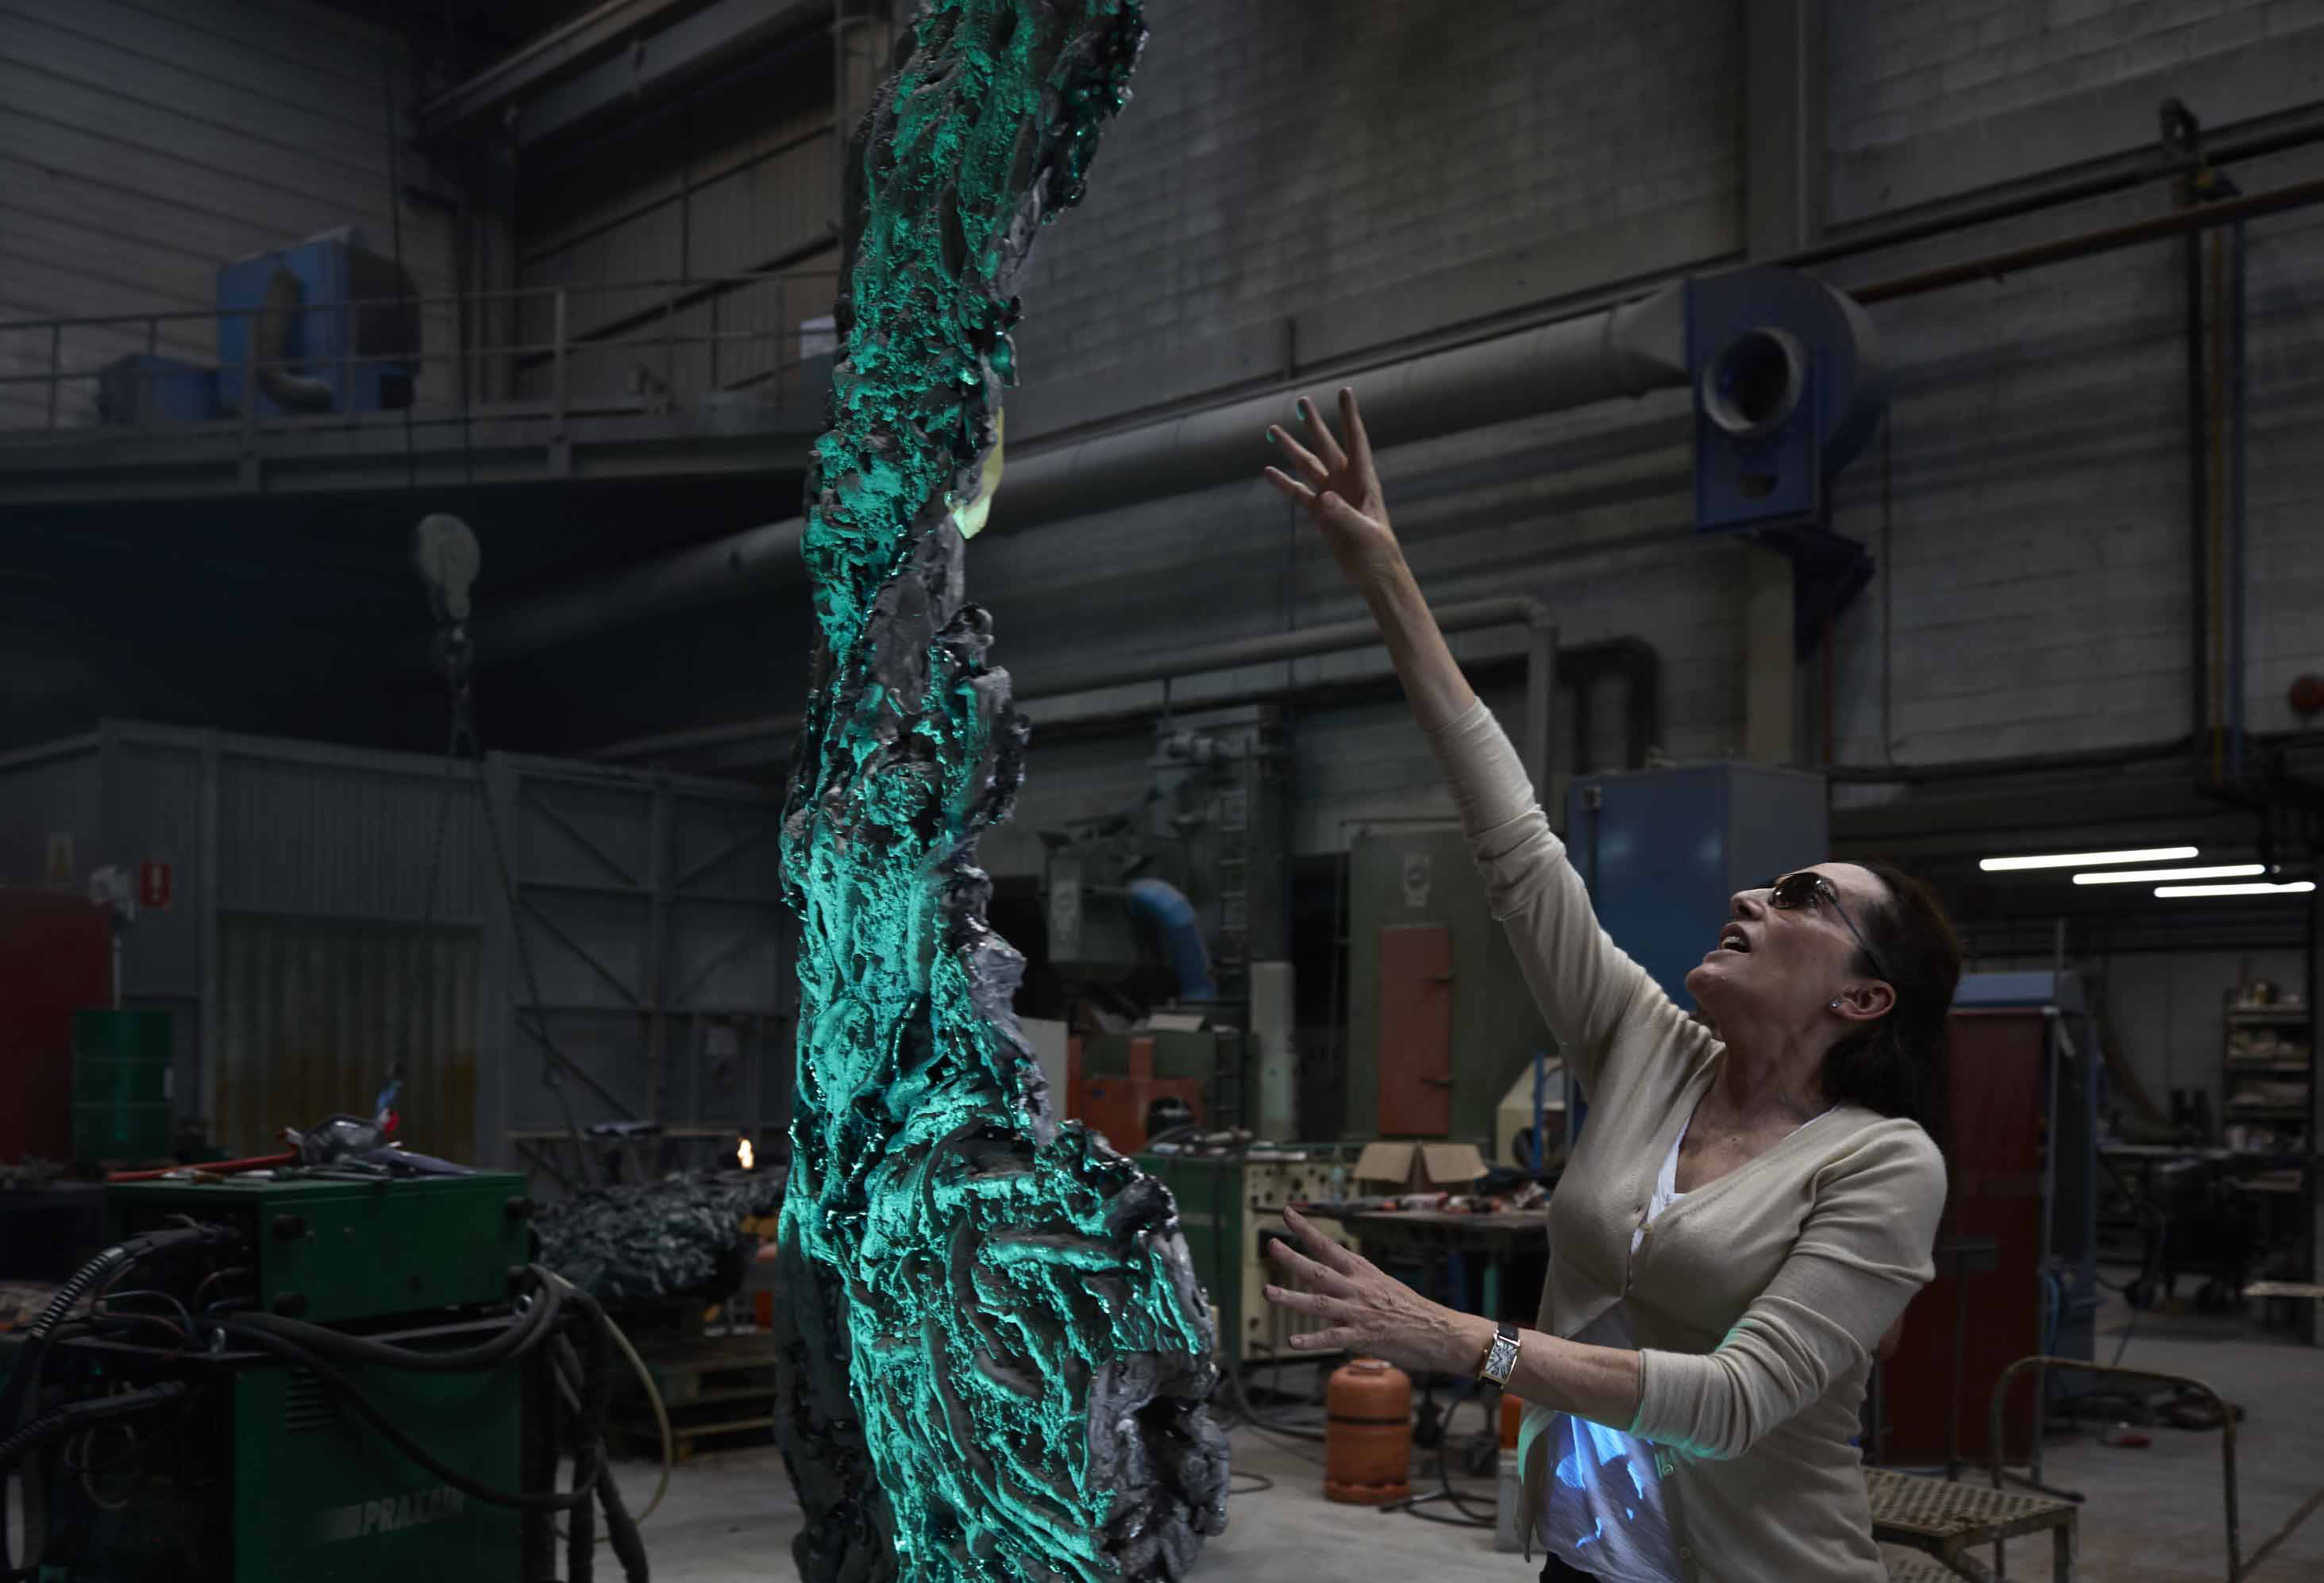 Cristina Iglesias working in Alfa Arte.Sculpture GROWTH I, aluminum and glass.